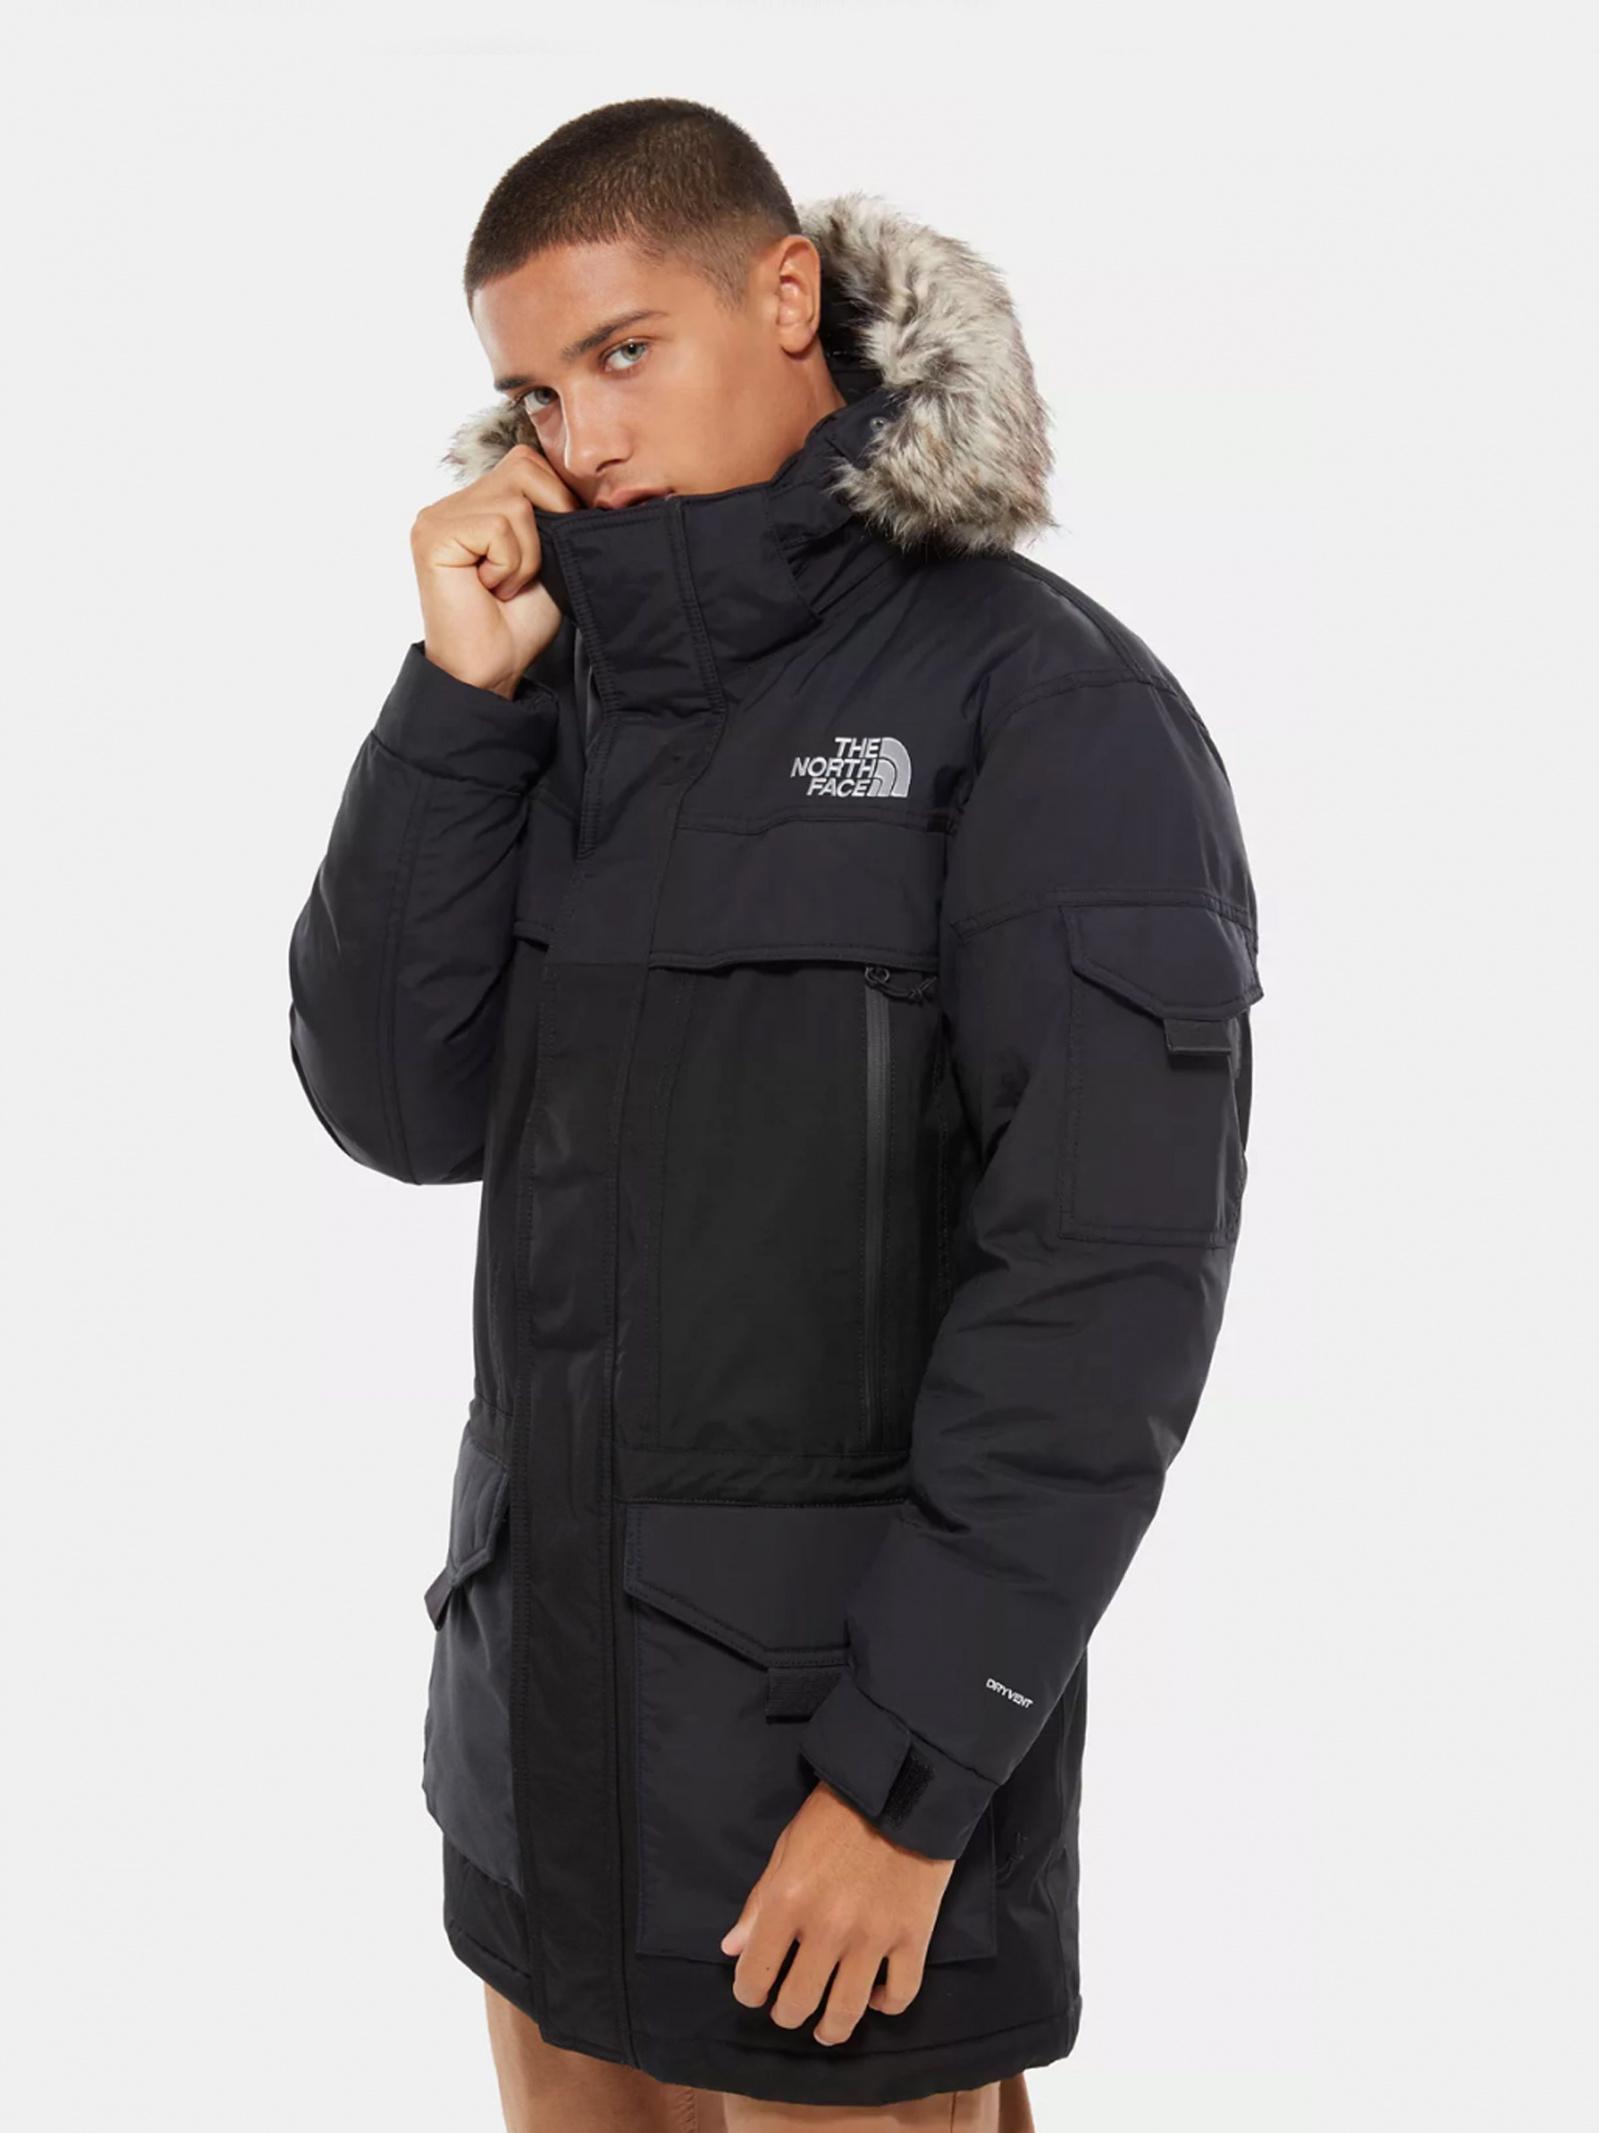 Куртка мужские The North Face модель N21079 цена, 2017